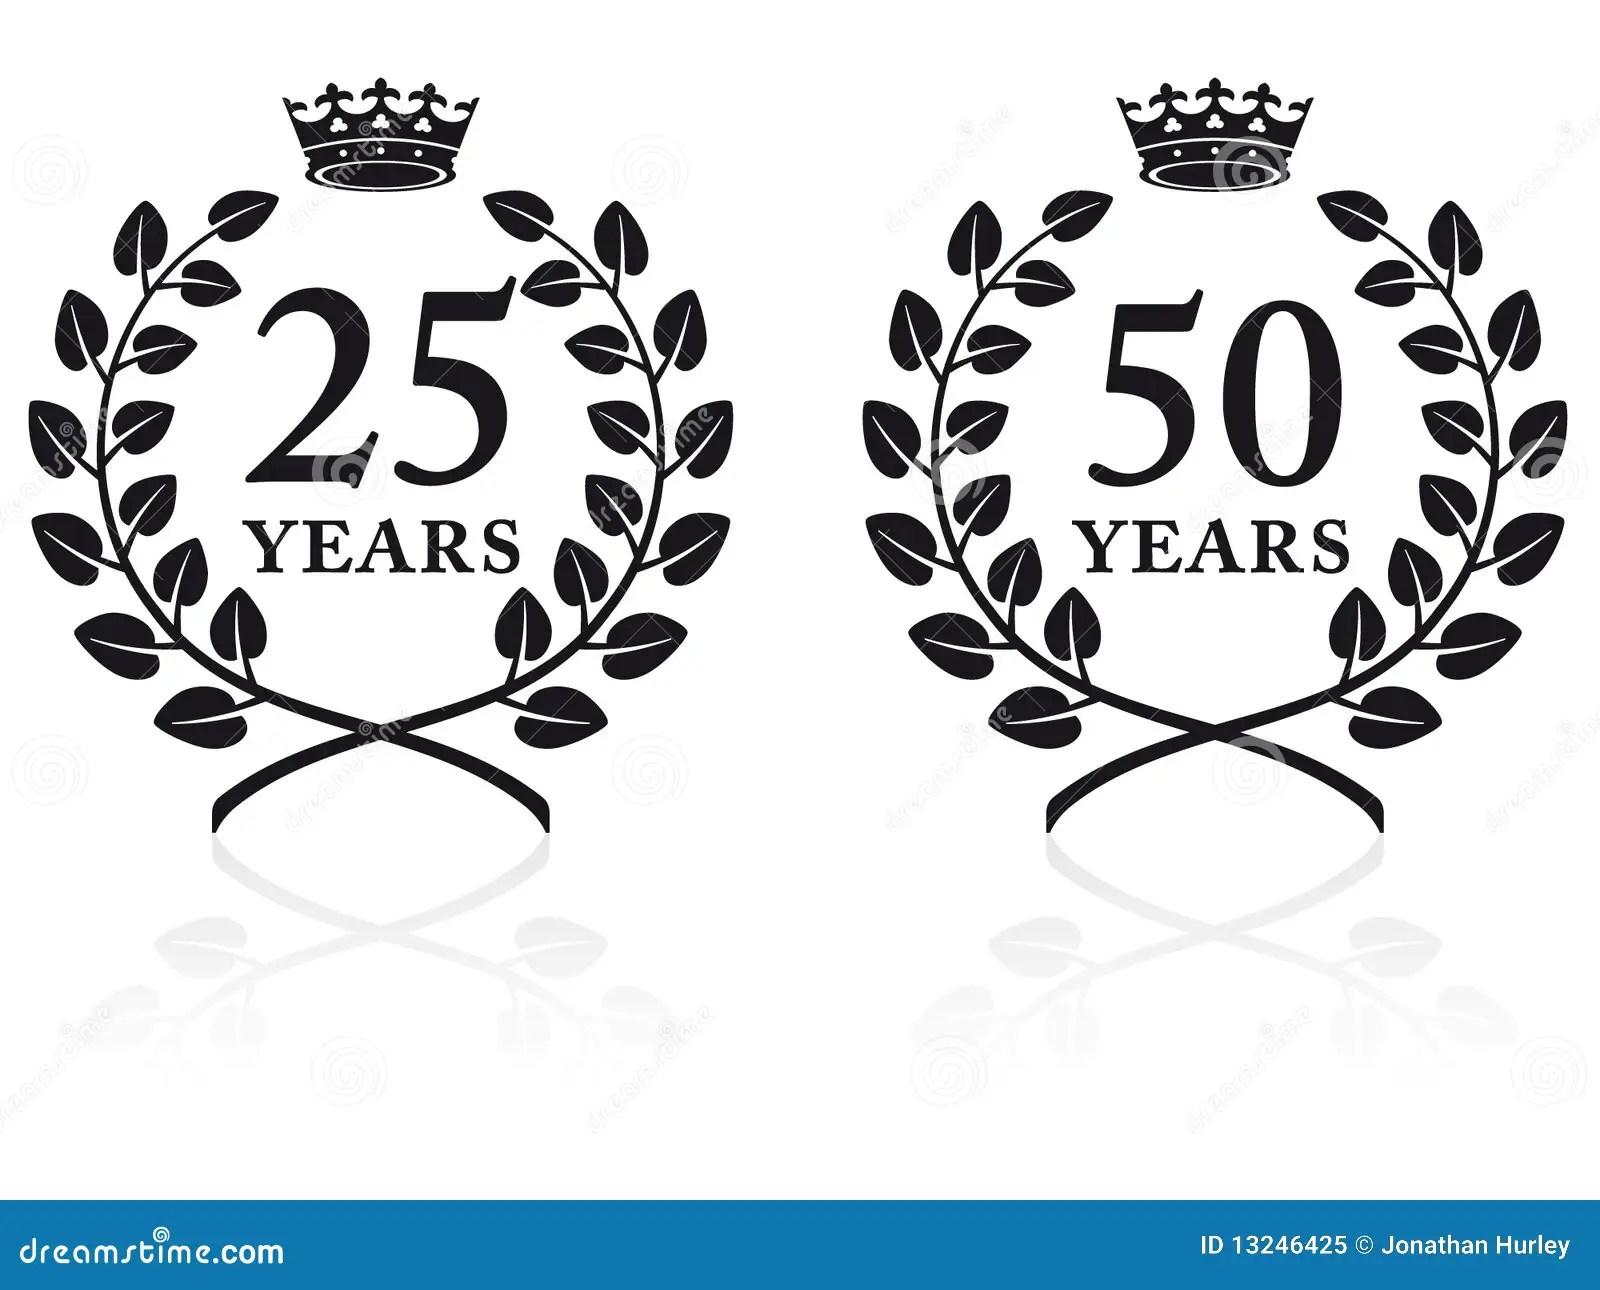 Anniversary Seals 2 Royalty Free Stock Photo